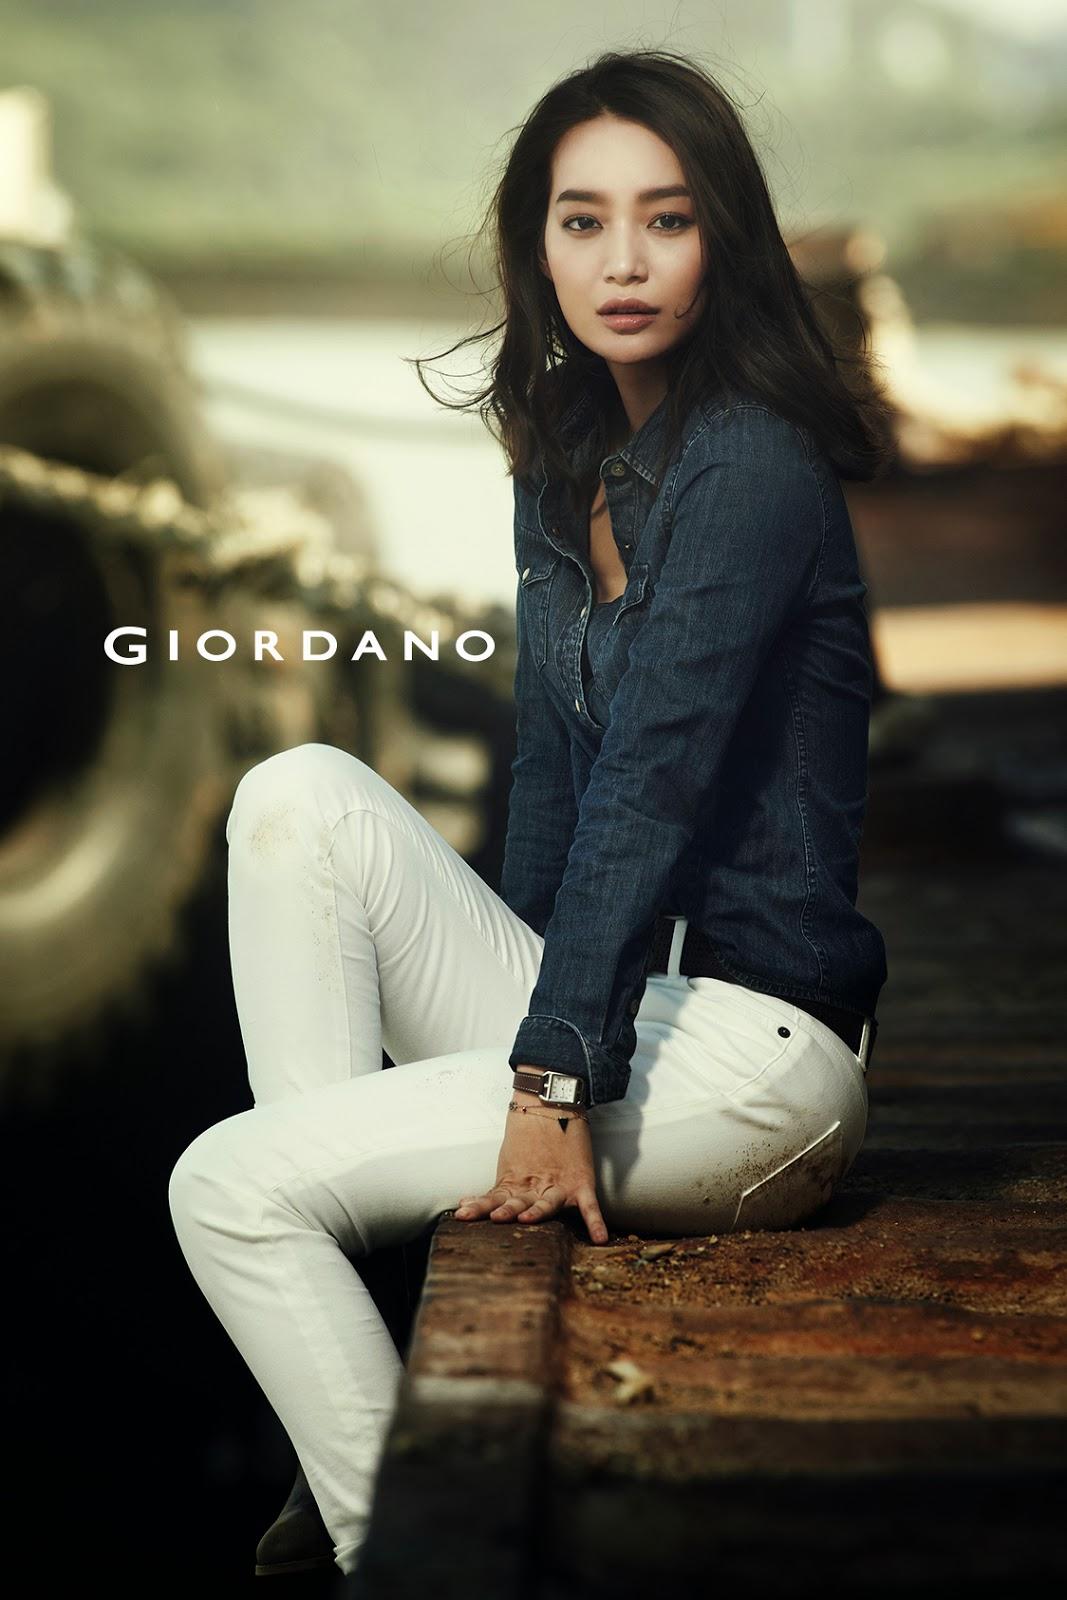 Giordano. Brand management